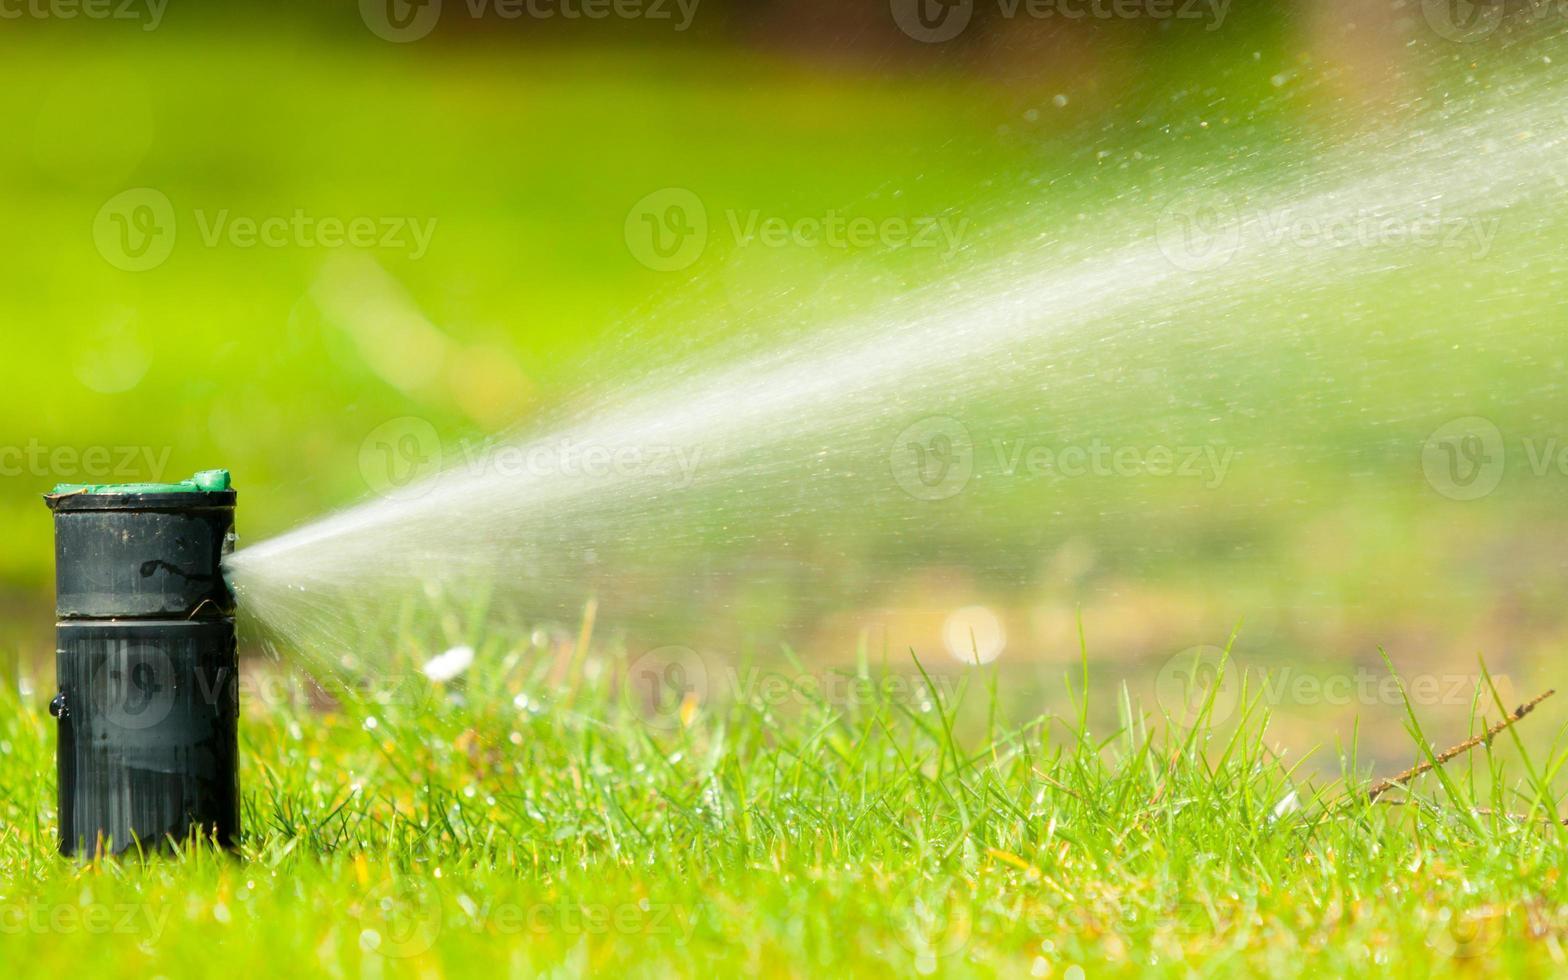 Gardening. Lawn sprinkler spraying water over grass. photo